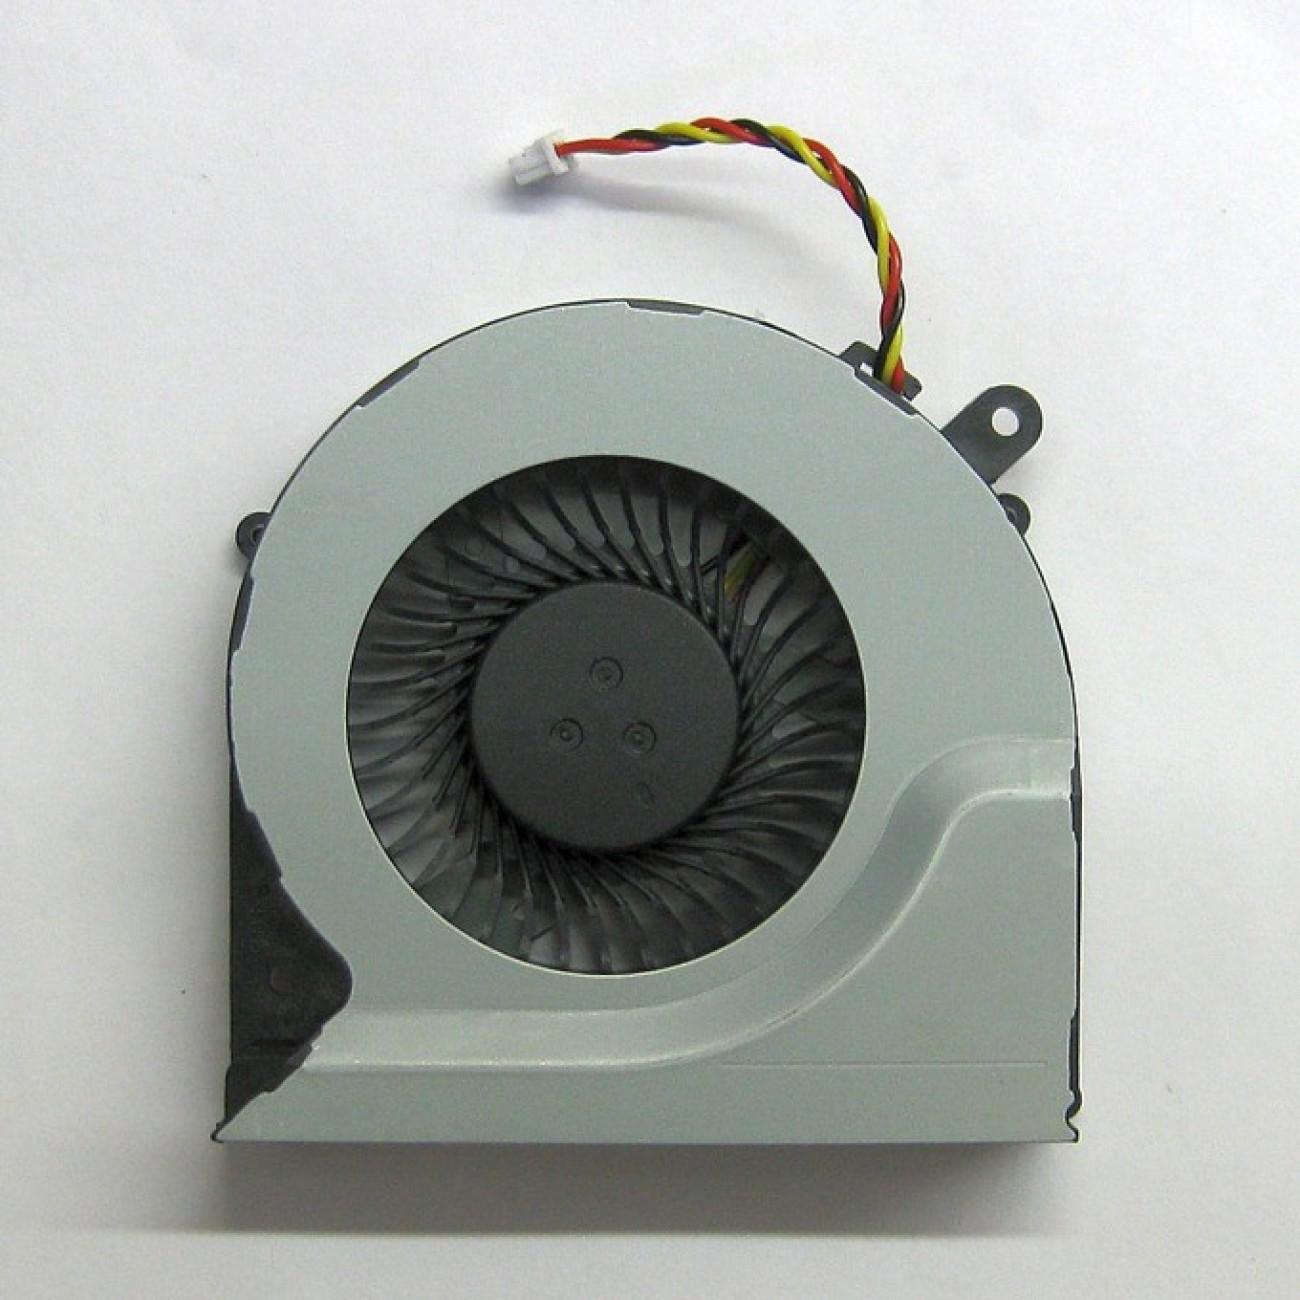 Вентилатор с охладител за лаптоп, Toshiba Satellite C850, C855, C875, C870, L850, L870 в Резервни части -  | Alleop